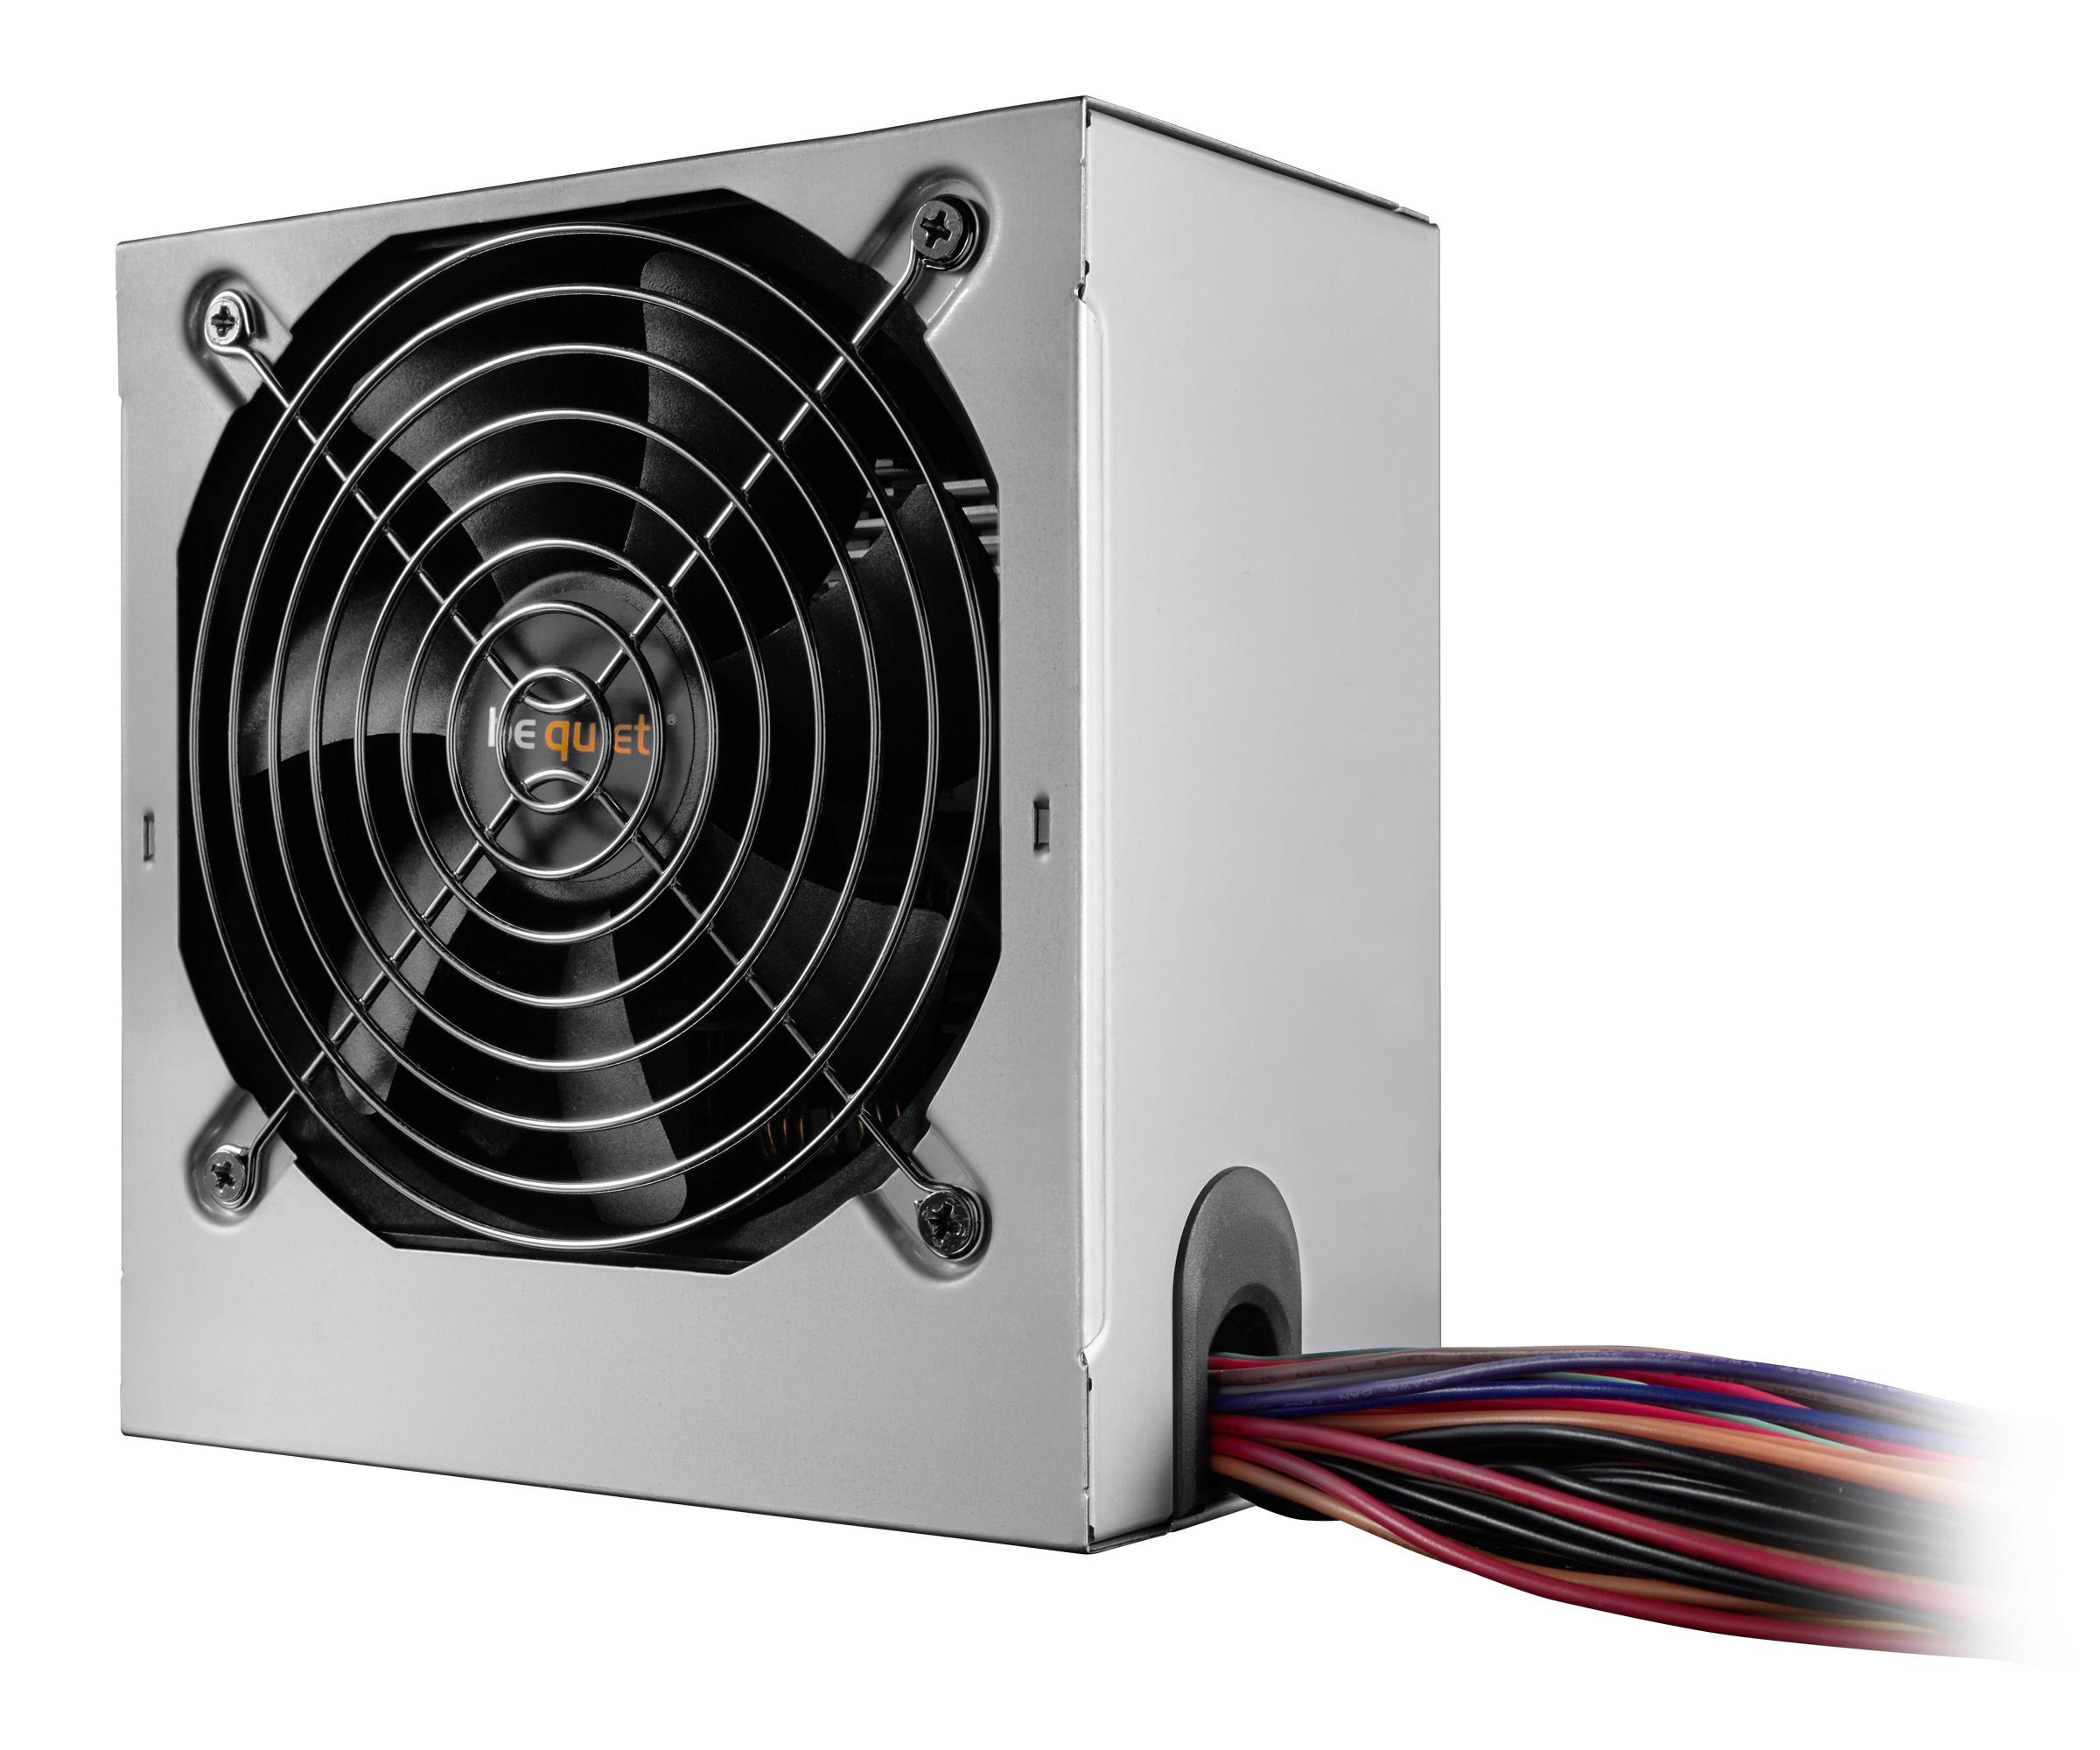 be quiet! System Power B9 450W, 80+ Bronze, ErP, Energy Star 6.1 APFC, 2xPCI-Ex, 6xSATA, 2xPATA, DC-DC // SB9-450W, bulk 10 per doos